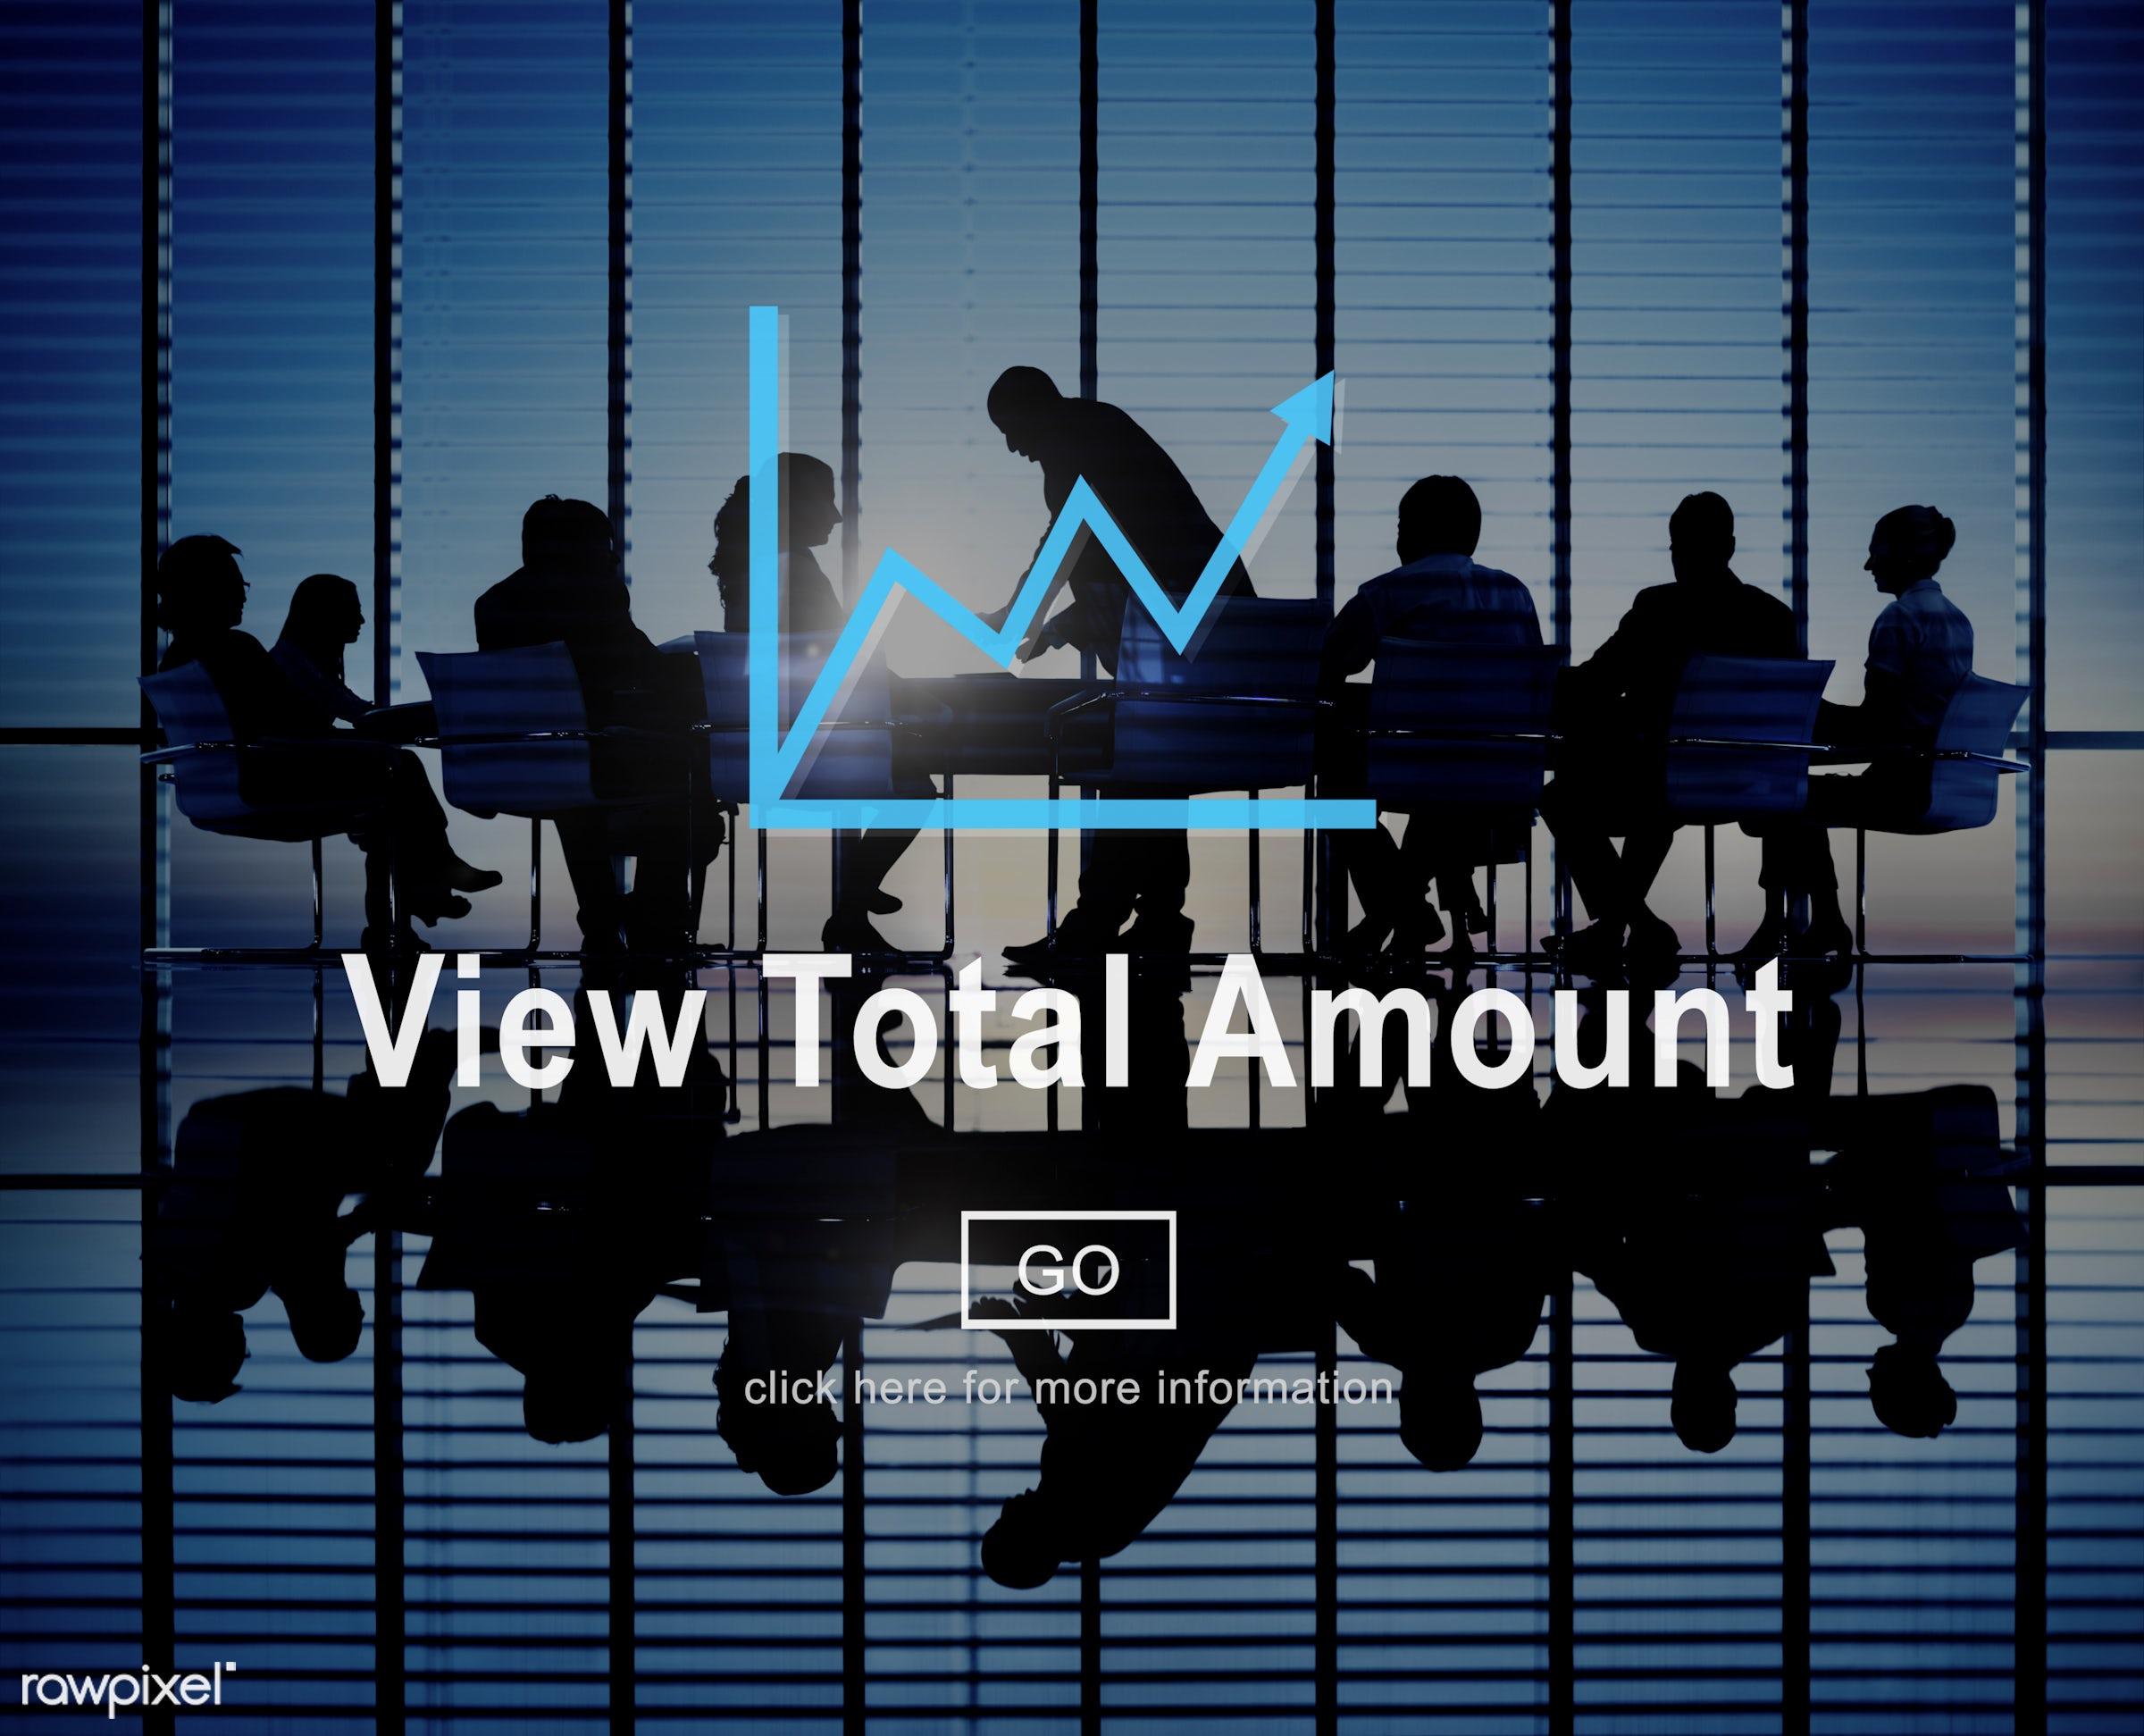 tax, amount, analysis, back lit, bar graph, billing, brainstorming, business, businessmen, businesswomen, calculate,...